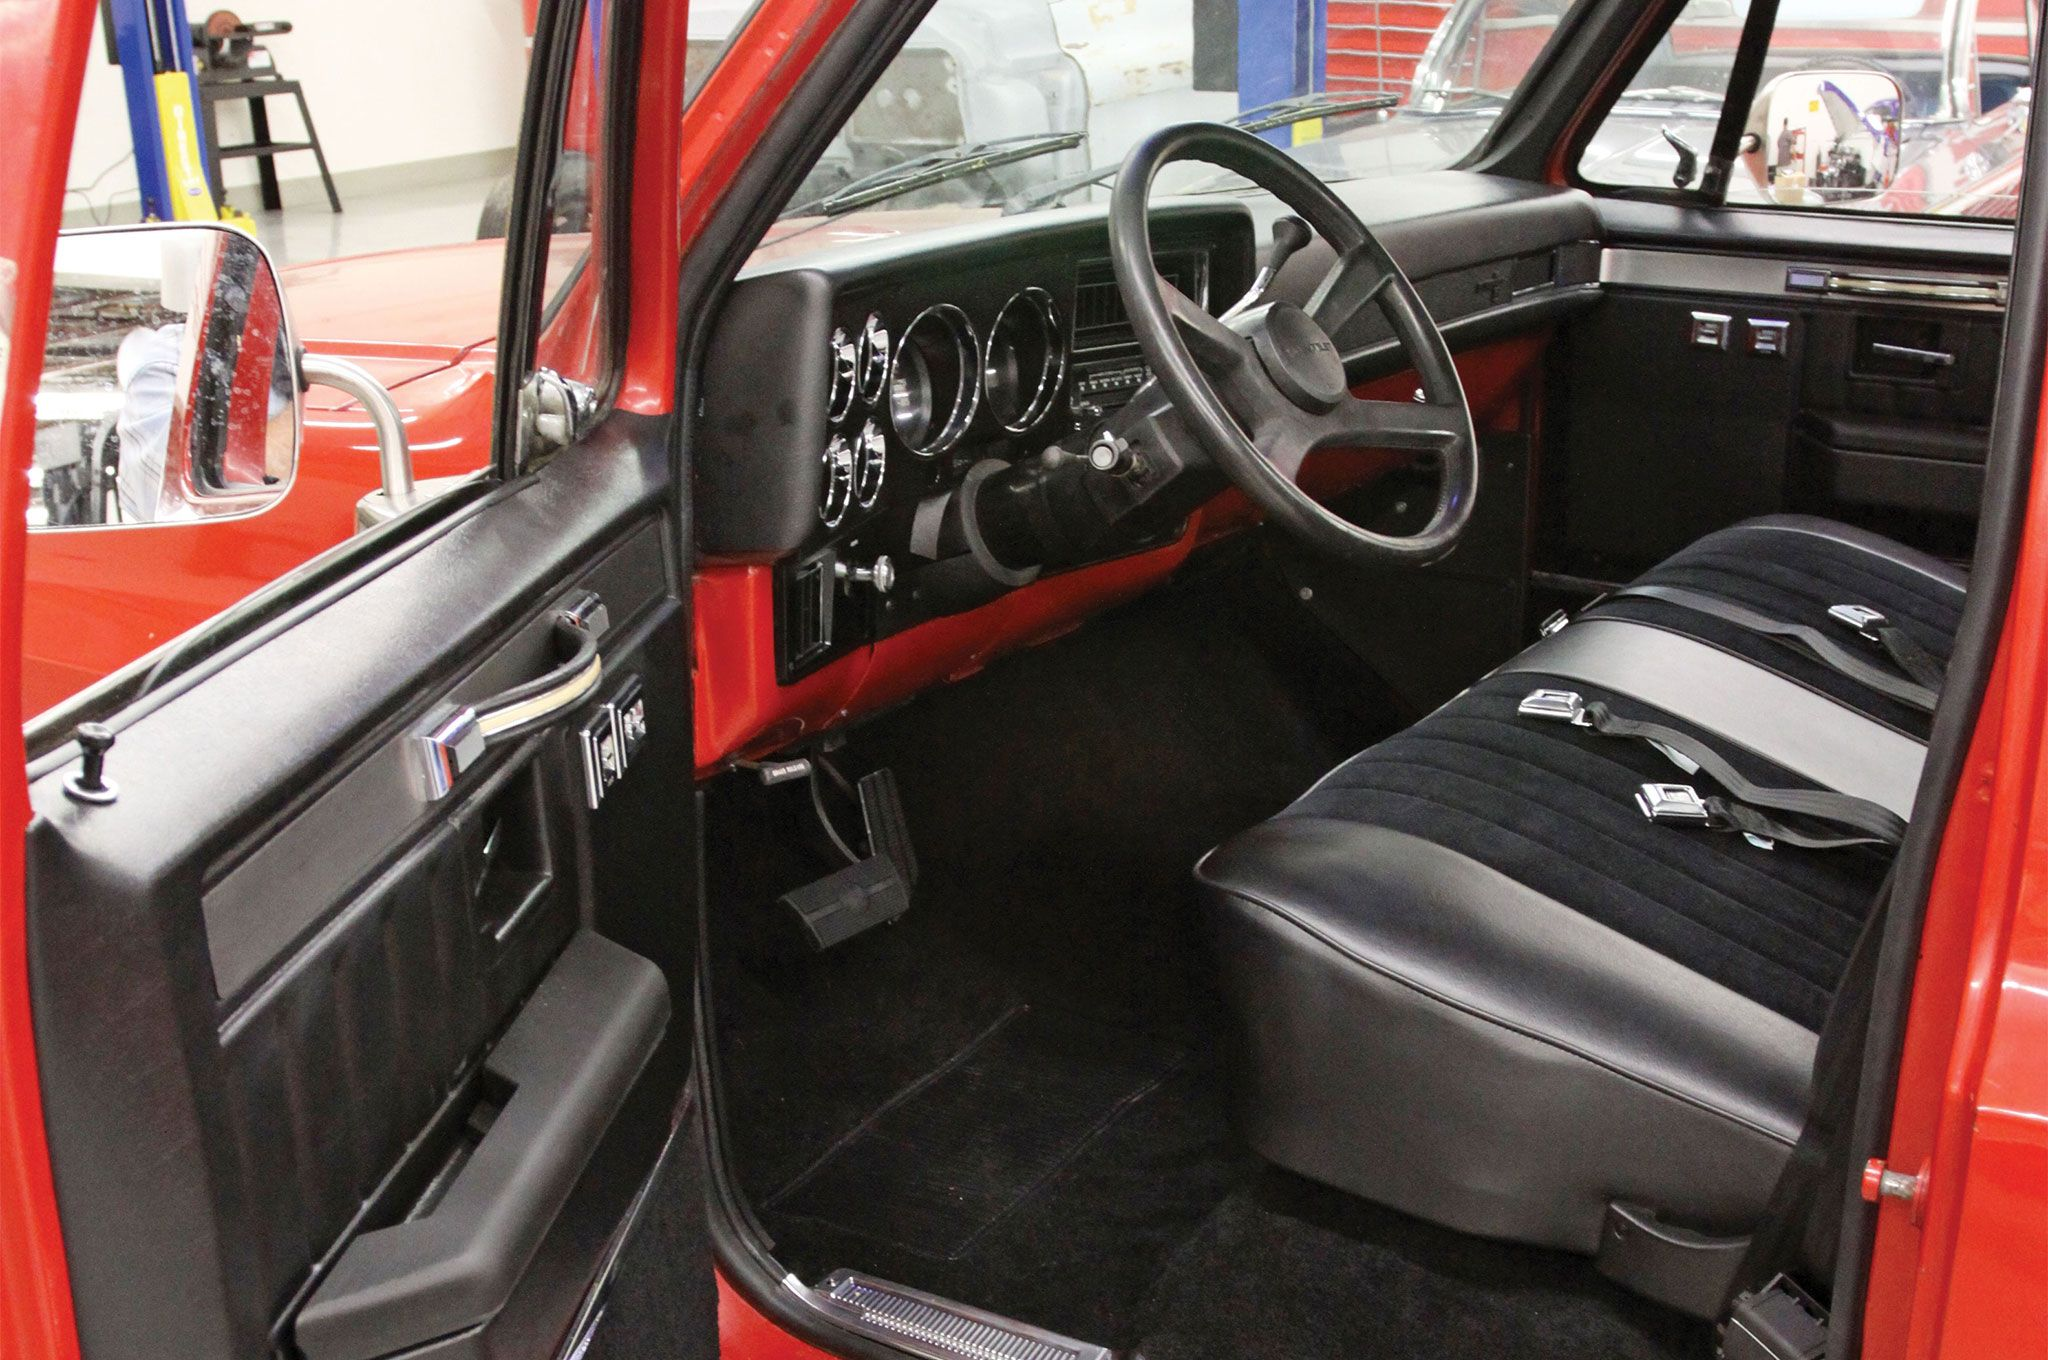 Revamping A 1985 C10 Silverado Interior With Lmc Truck Hot Rod Network Chevy Trucks Lmc Truck 84 Chevy Truck